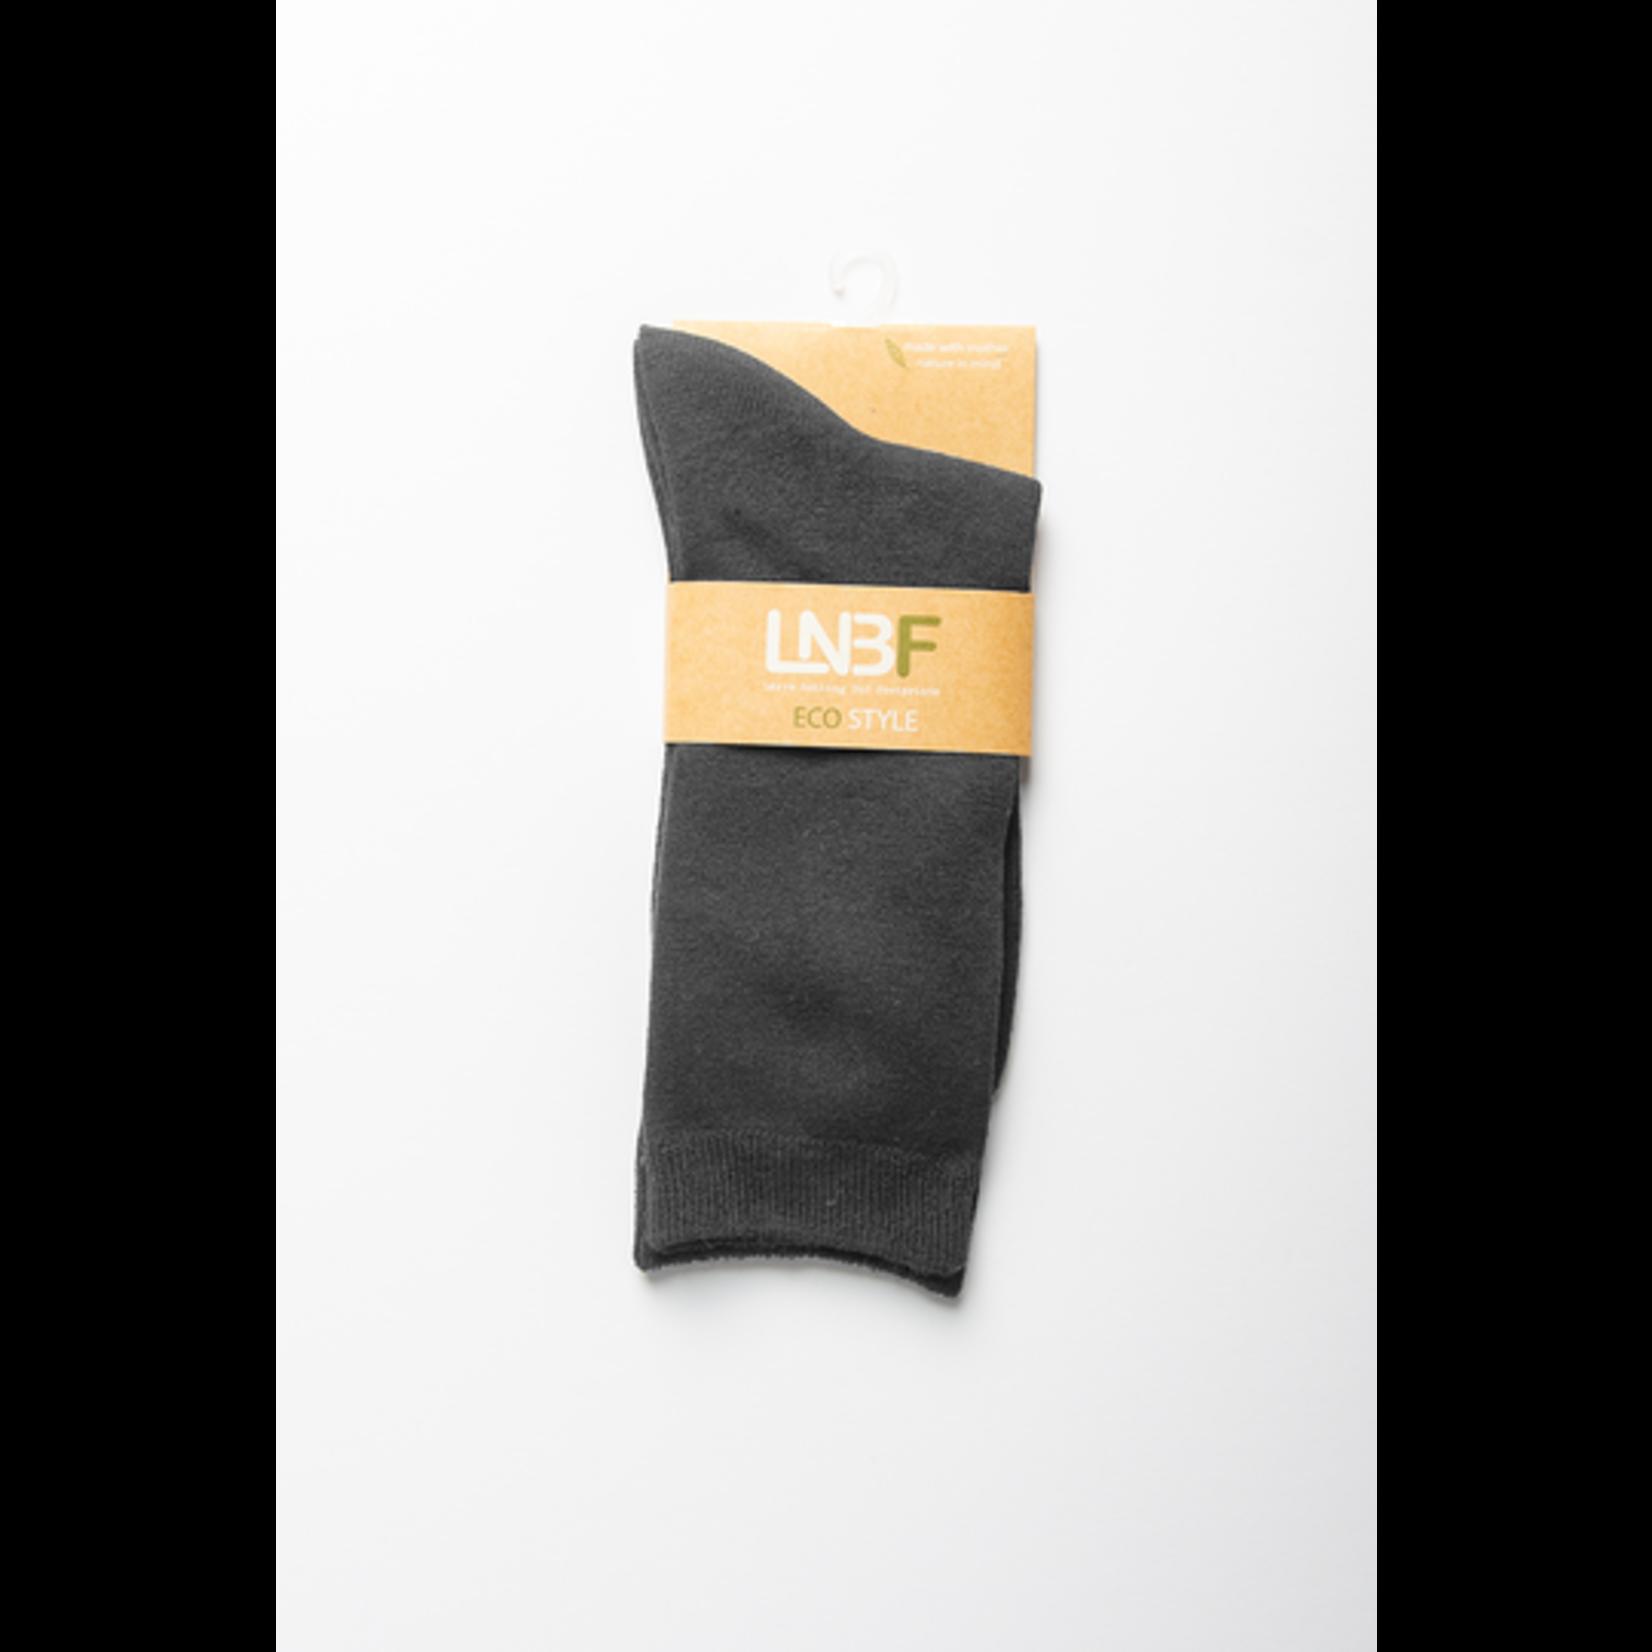 LNBF LNBF Bamboo  Socks